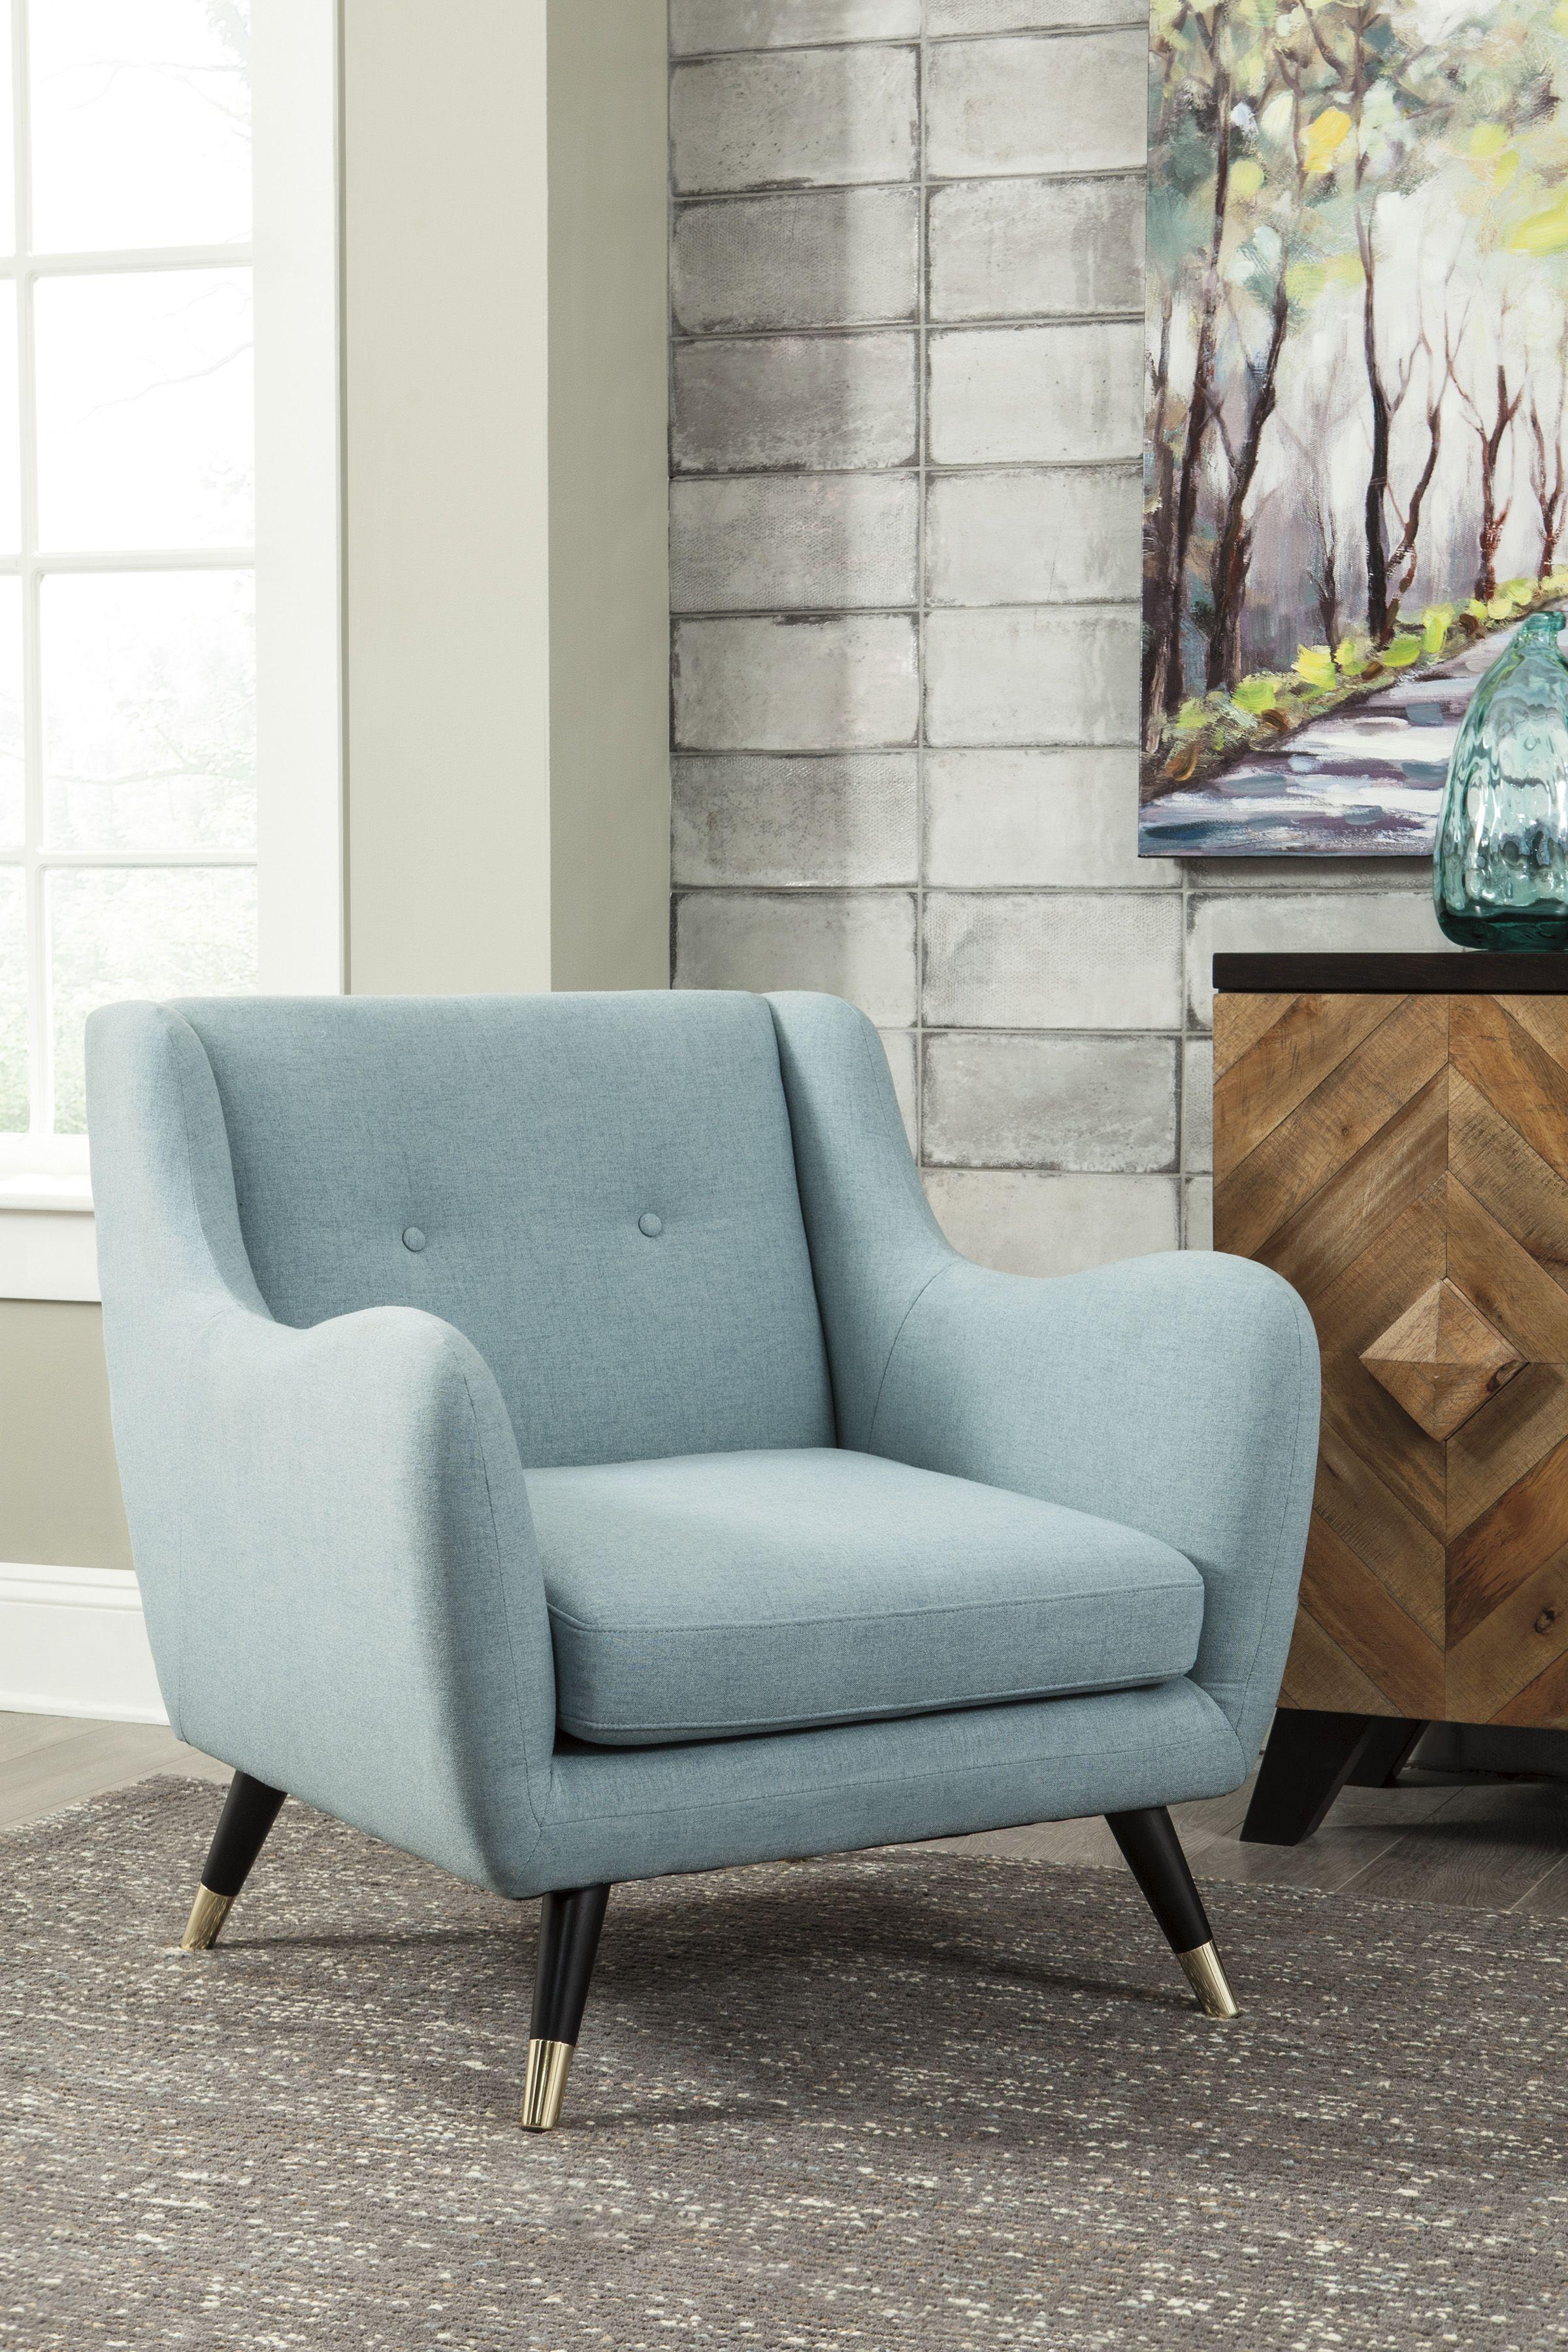 a3000034 menga mist accent chair mid century modern mood